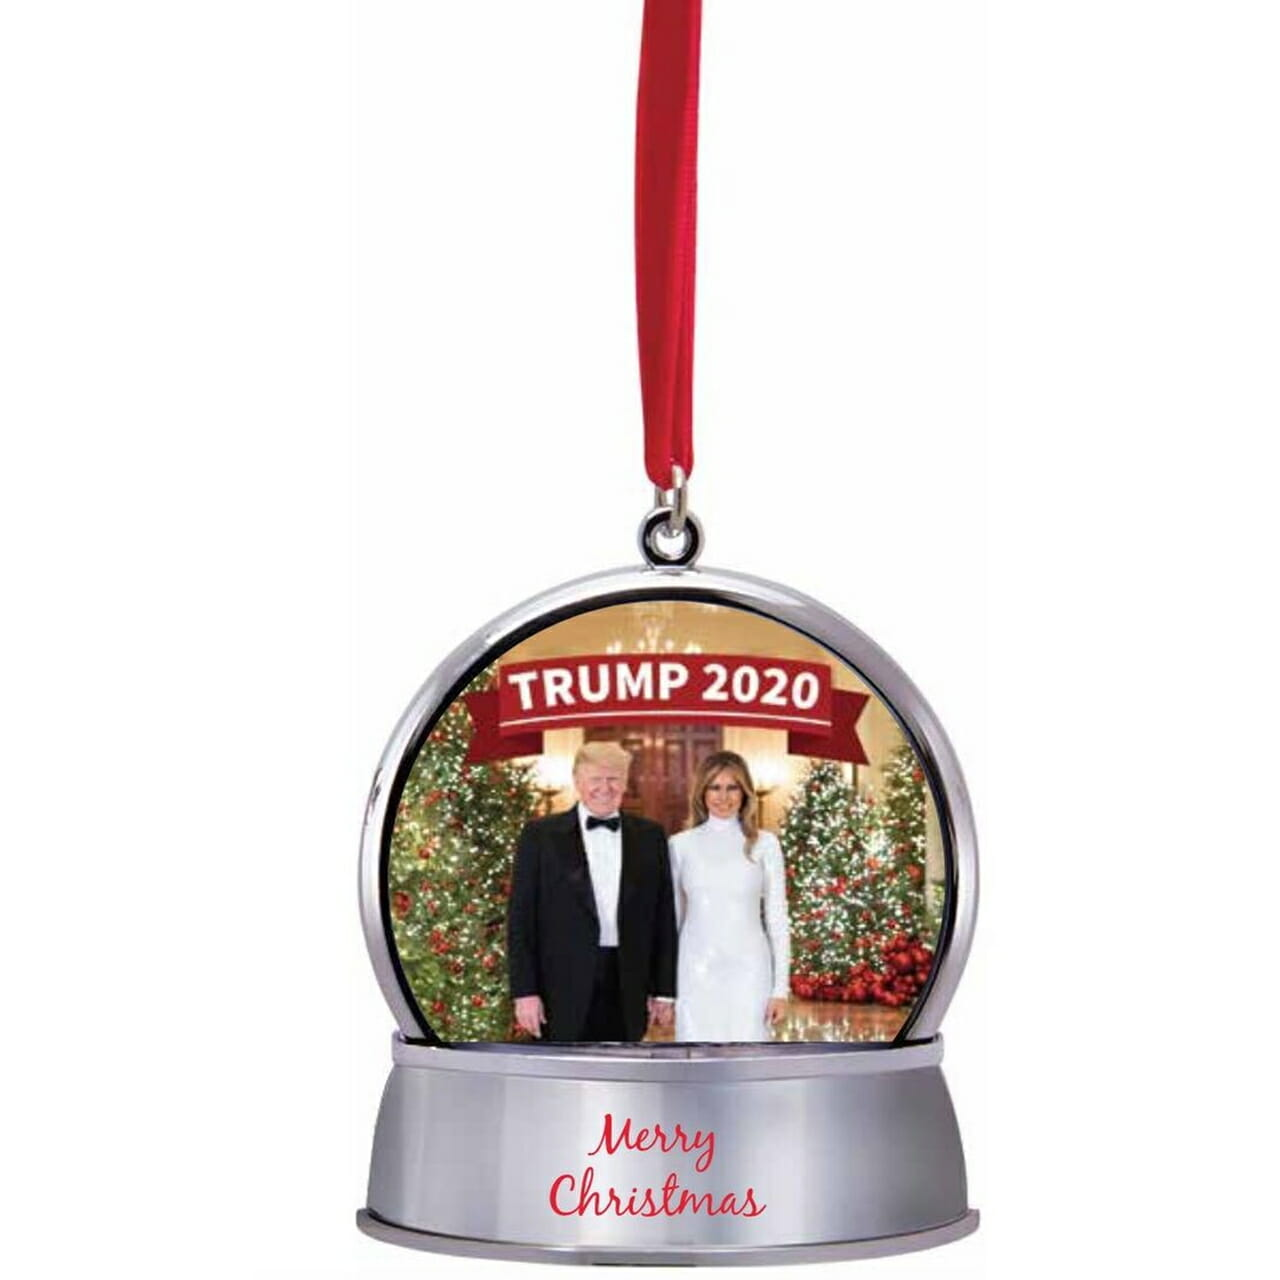 Trump 2020 Snow Globe